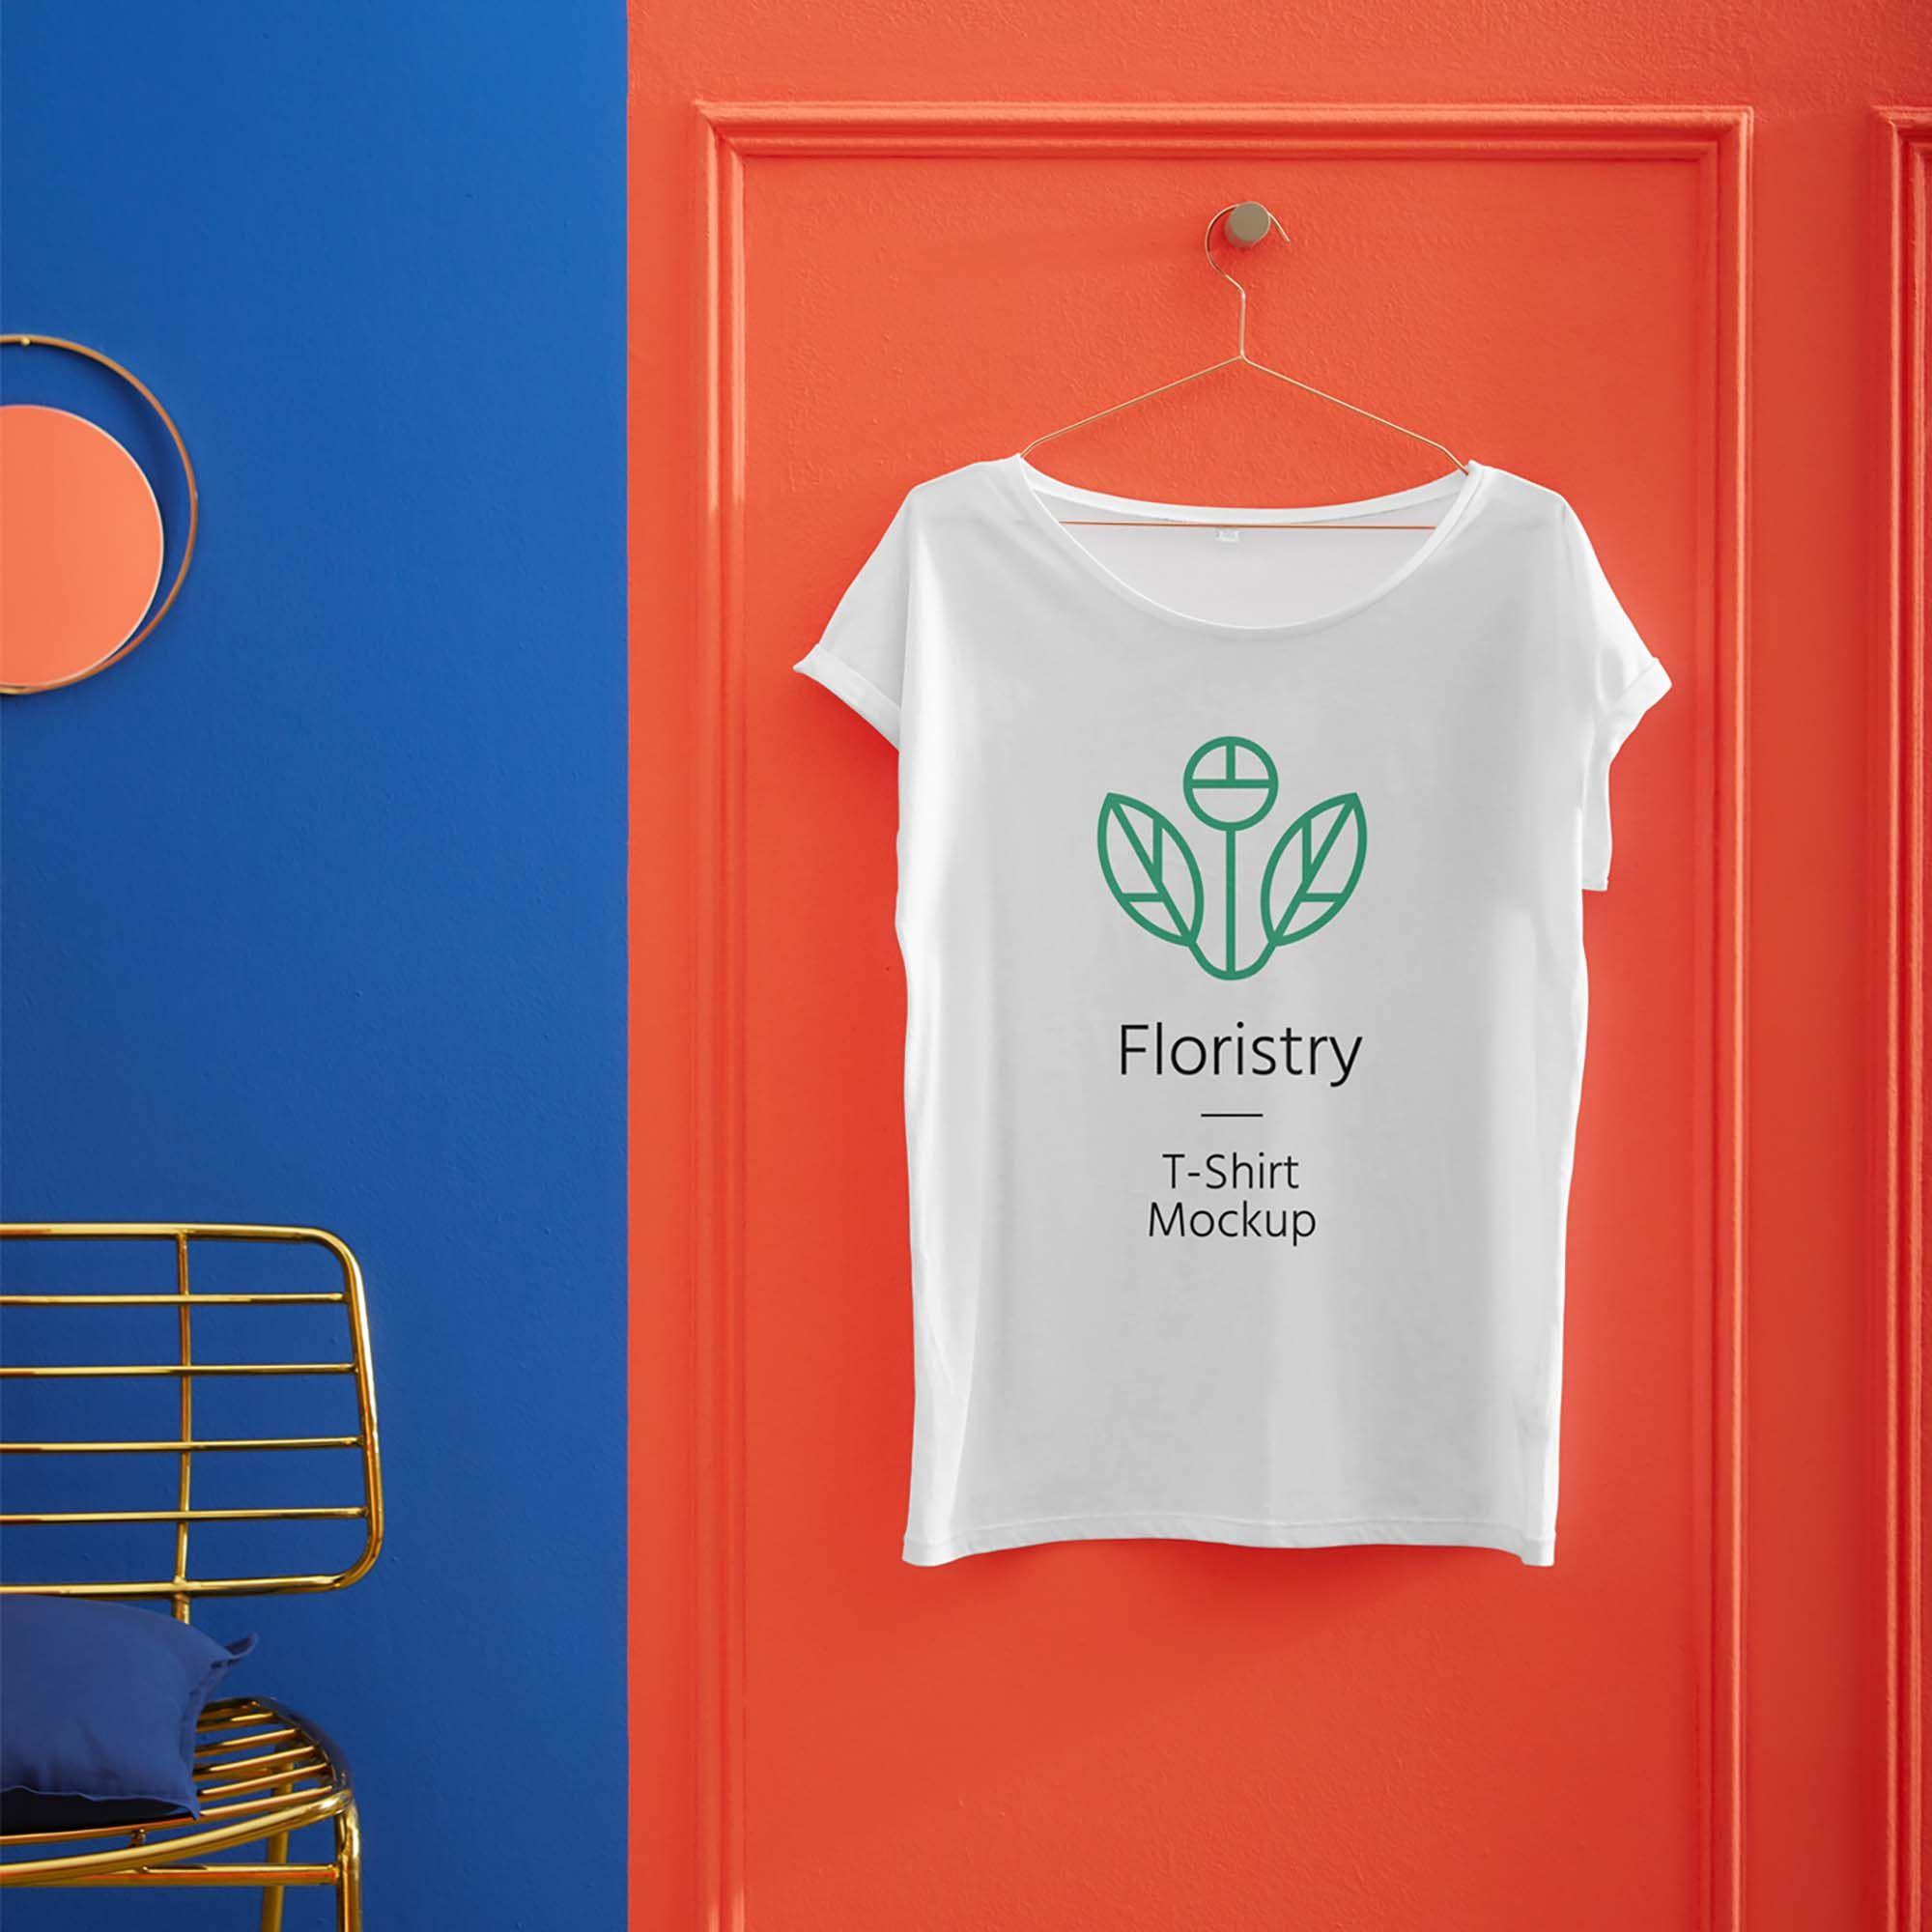 Download Free Hanging T Shirt Mockup Psd Shirt Mockup Tshirt Mockup Design Mockup Free